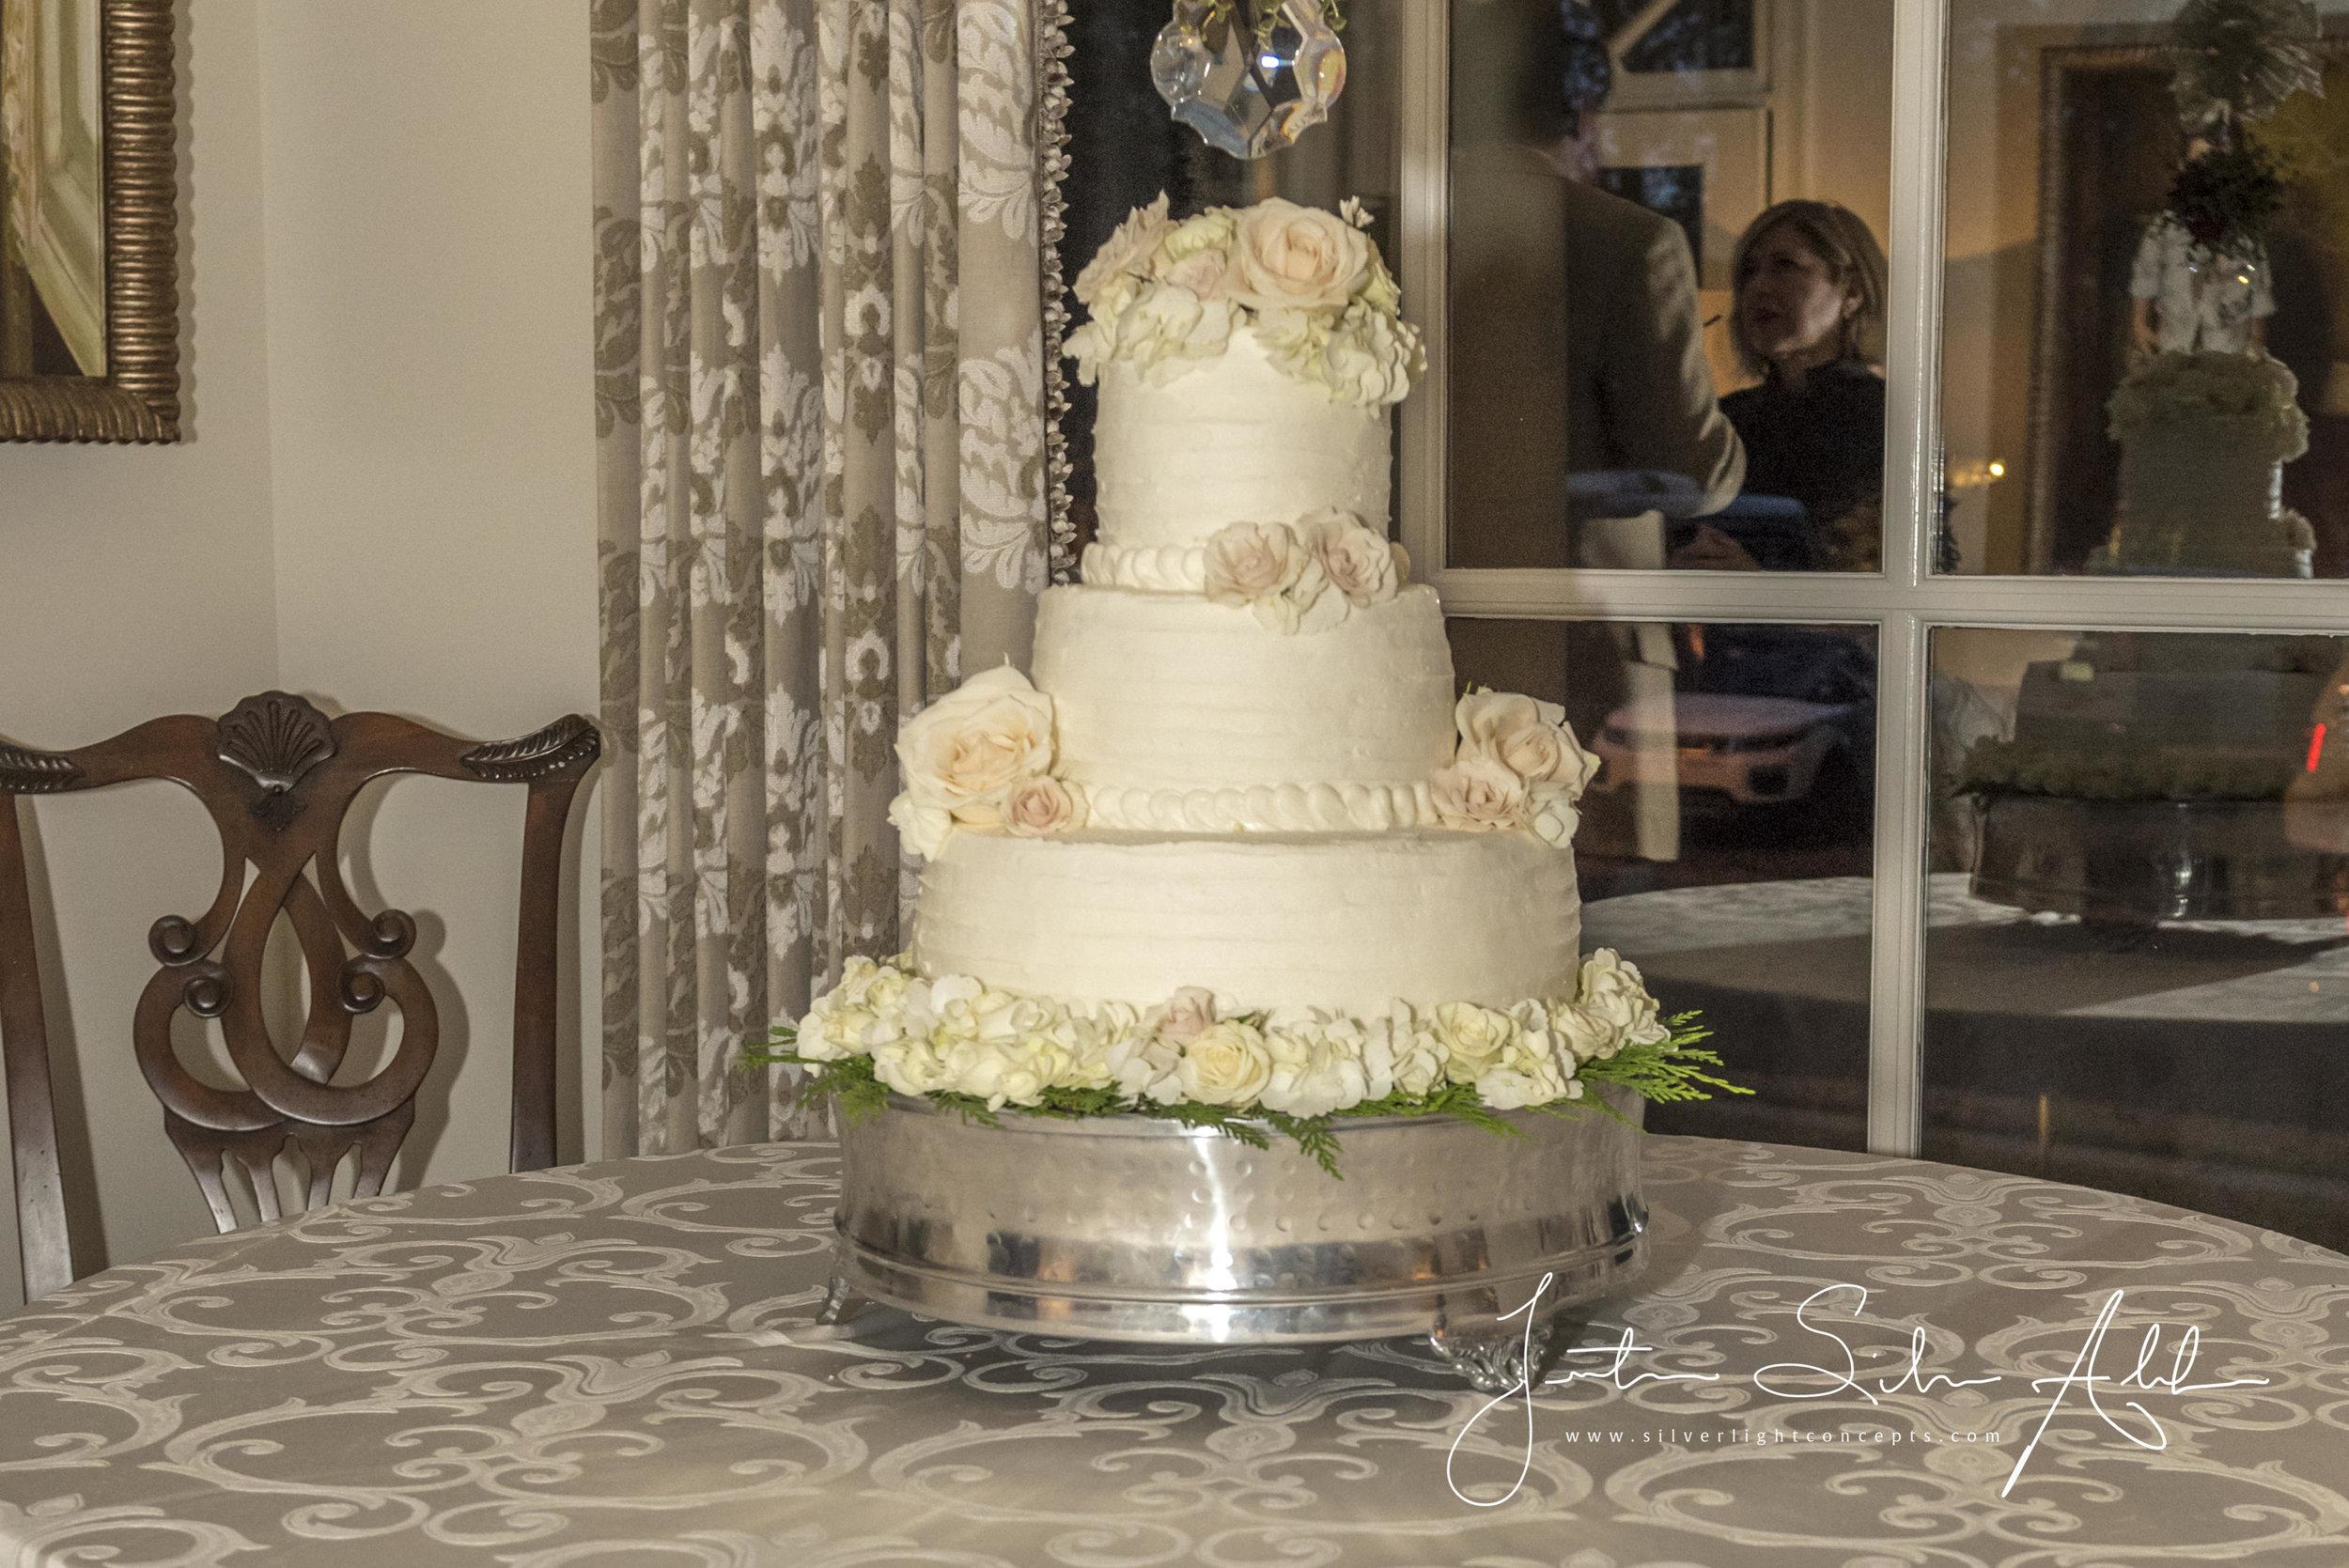 smalling_wedding-2.jpg